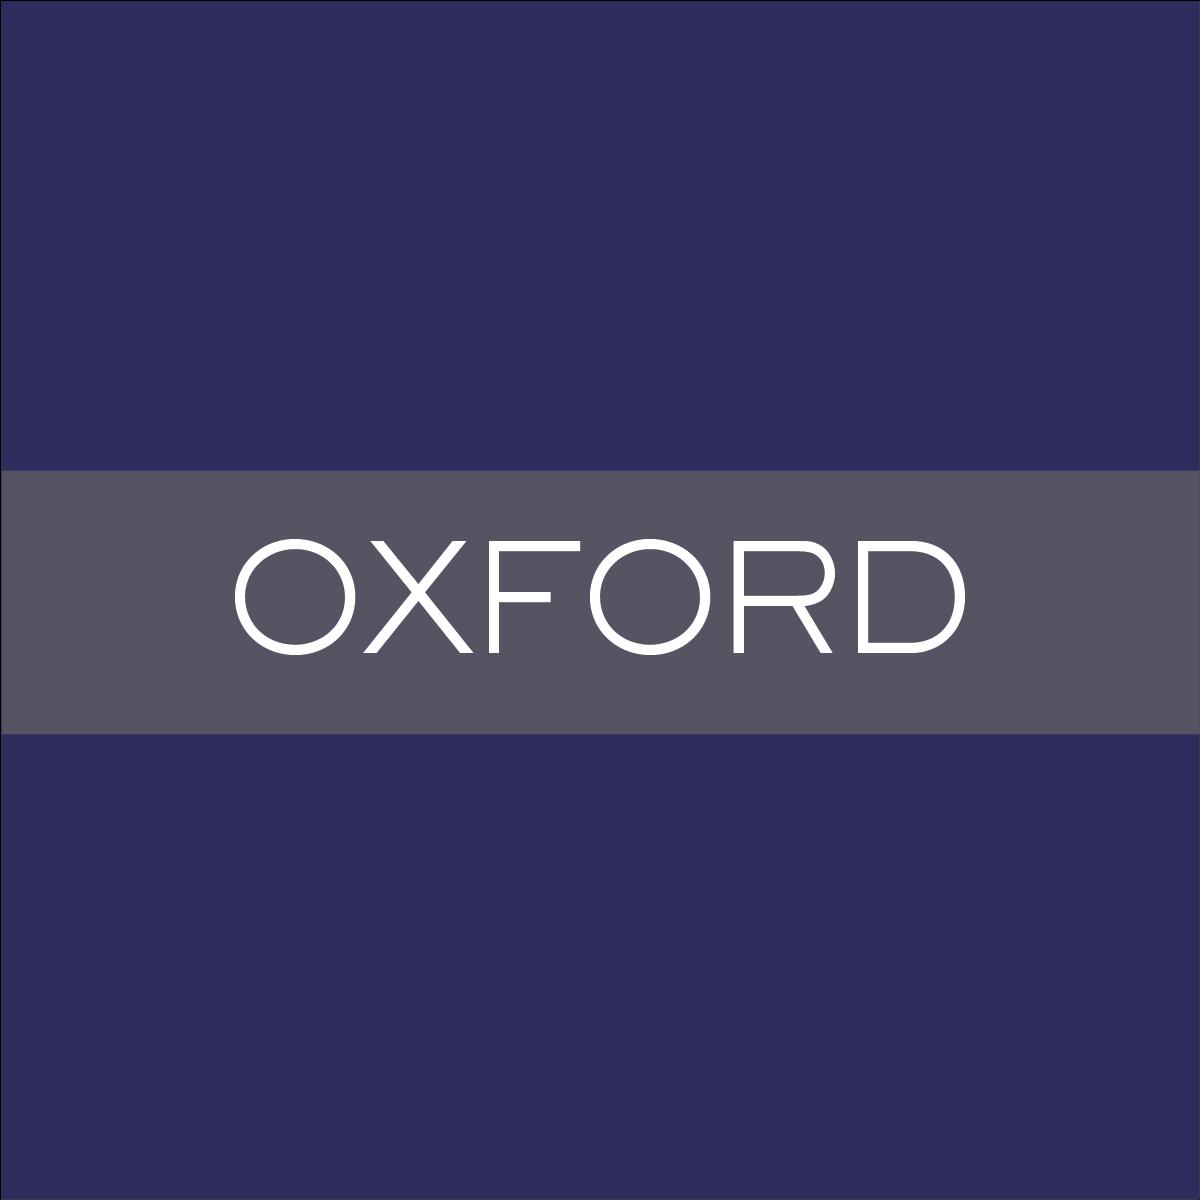 BN_Duplex_Oxford.jpg